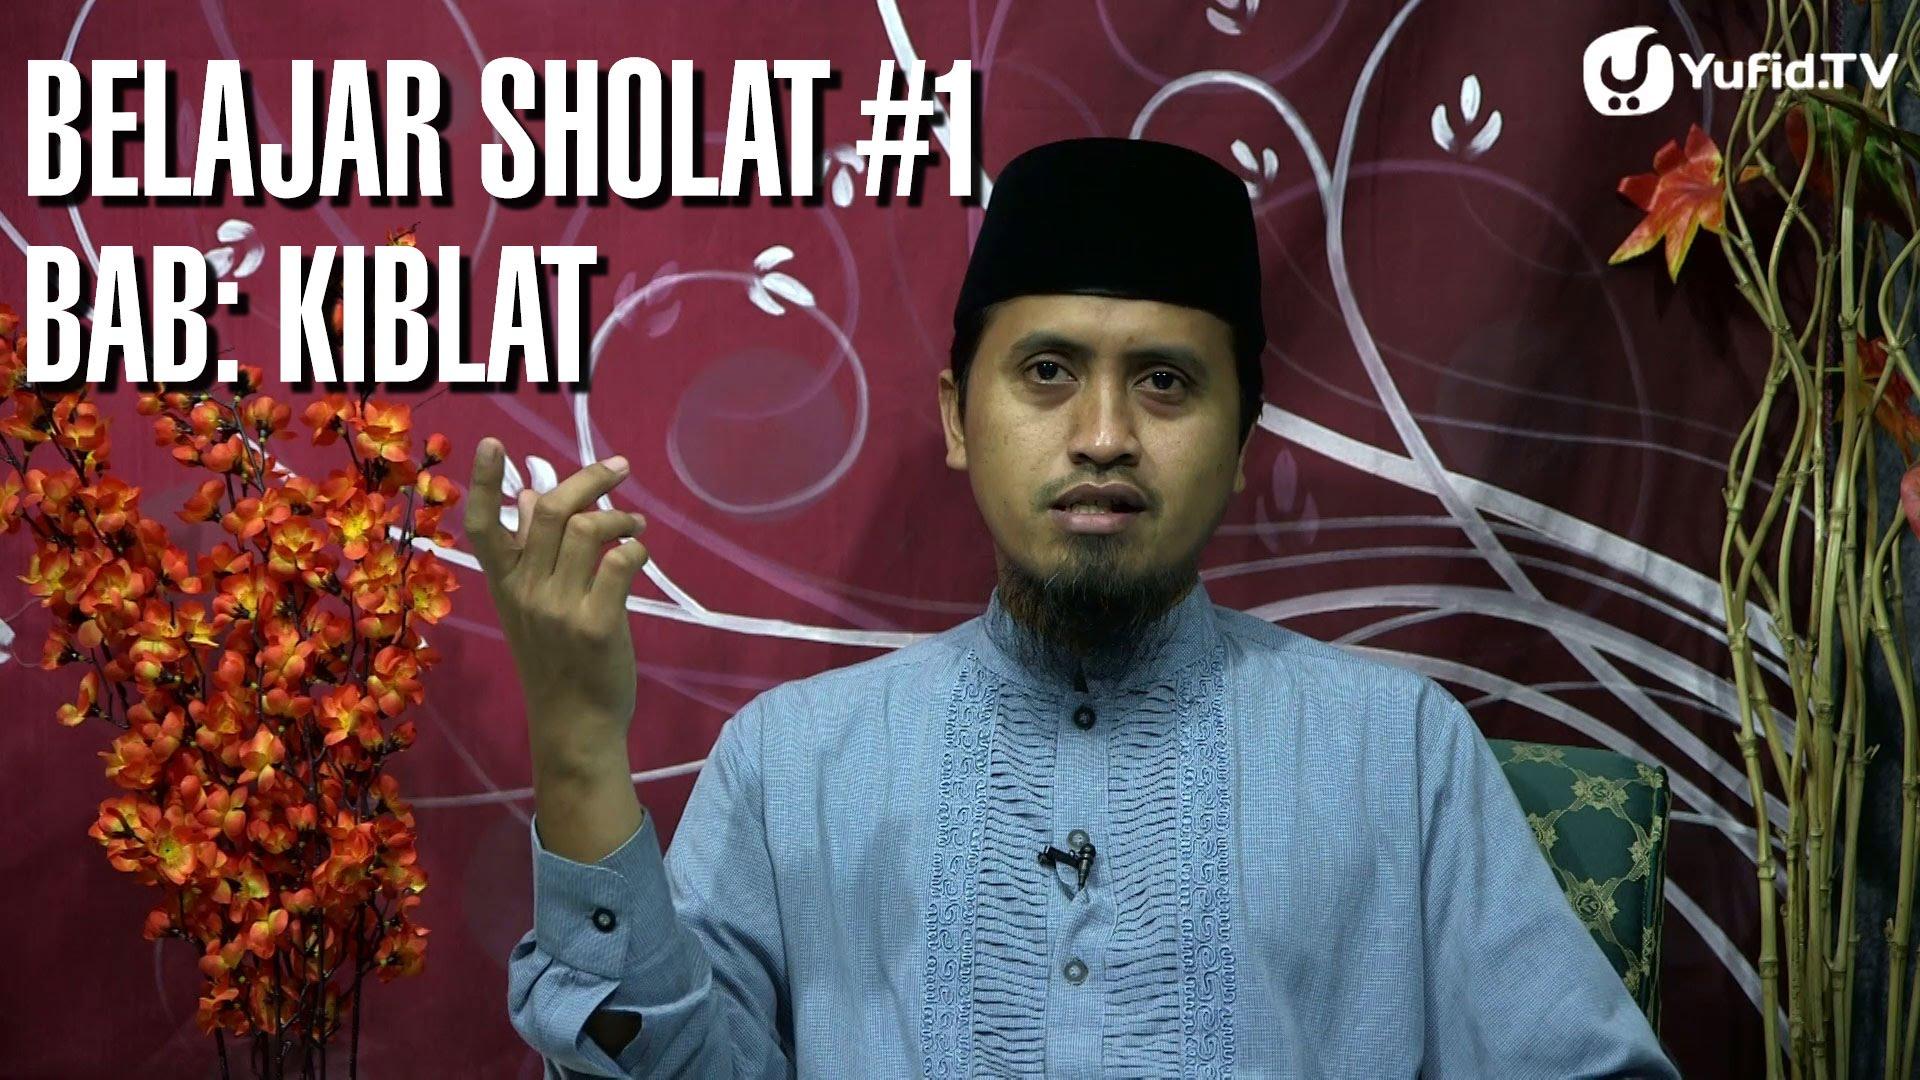 Belajar Sholat Bagian 1 Bab Kiblat – Ustadz Abdullah Zaen ...